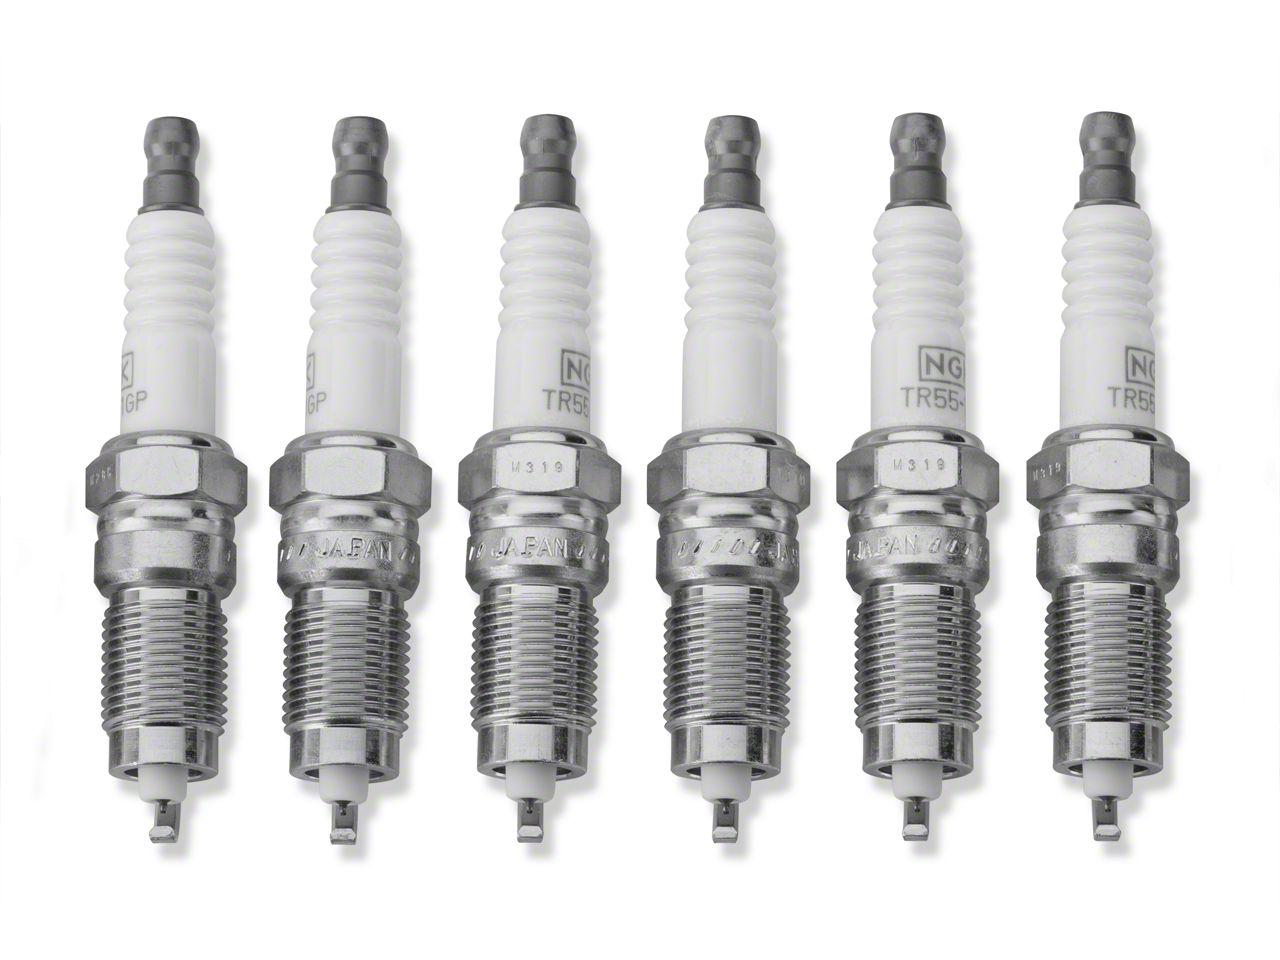 Add NGK Iridium IX Performance Spark Plugs (05-10 V6; 94-97 V6)